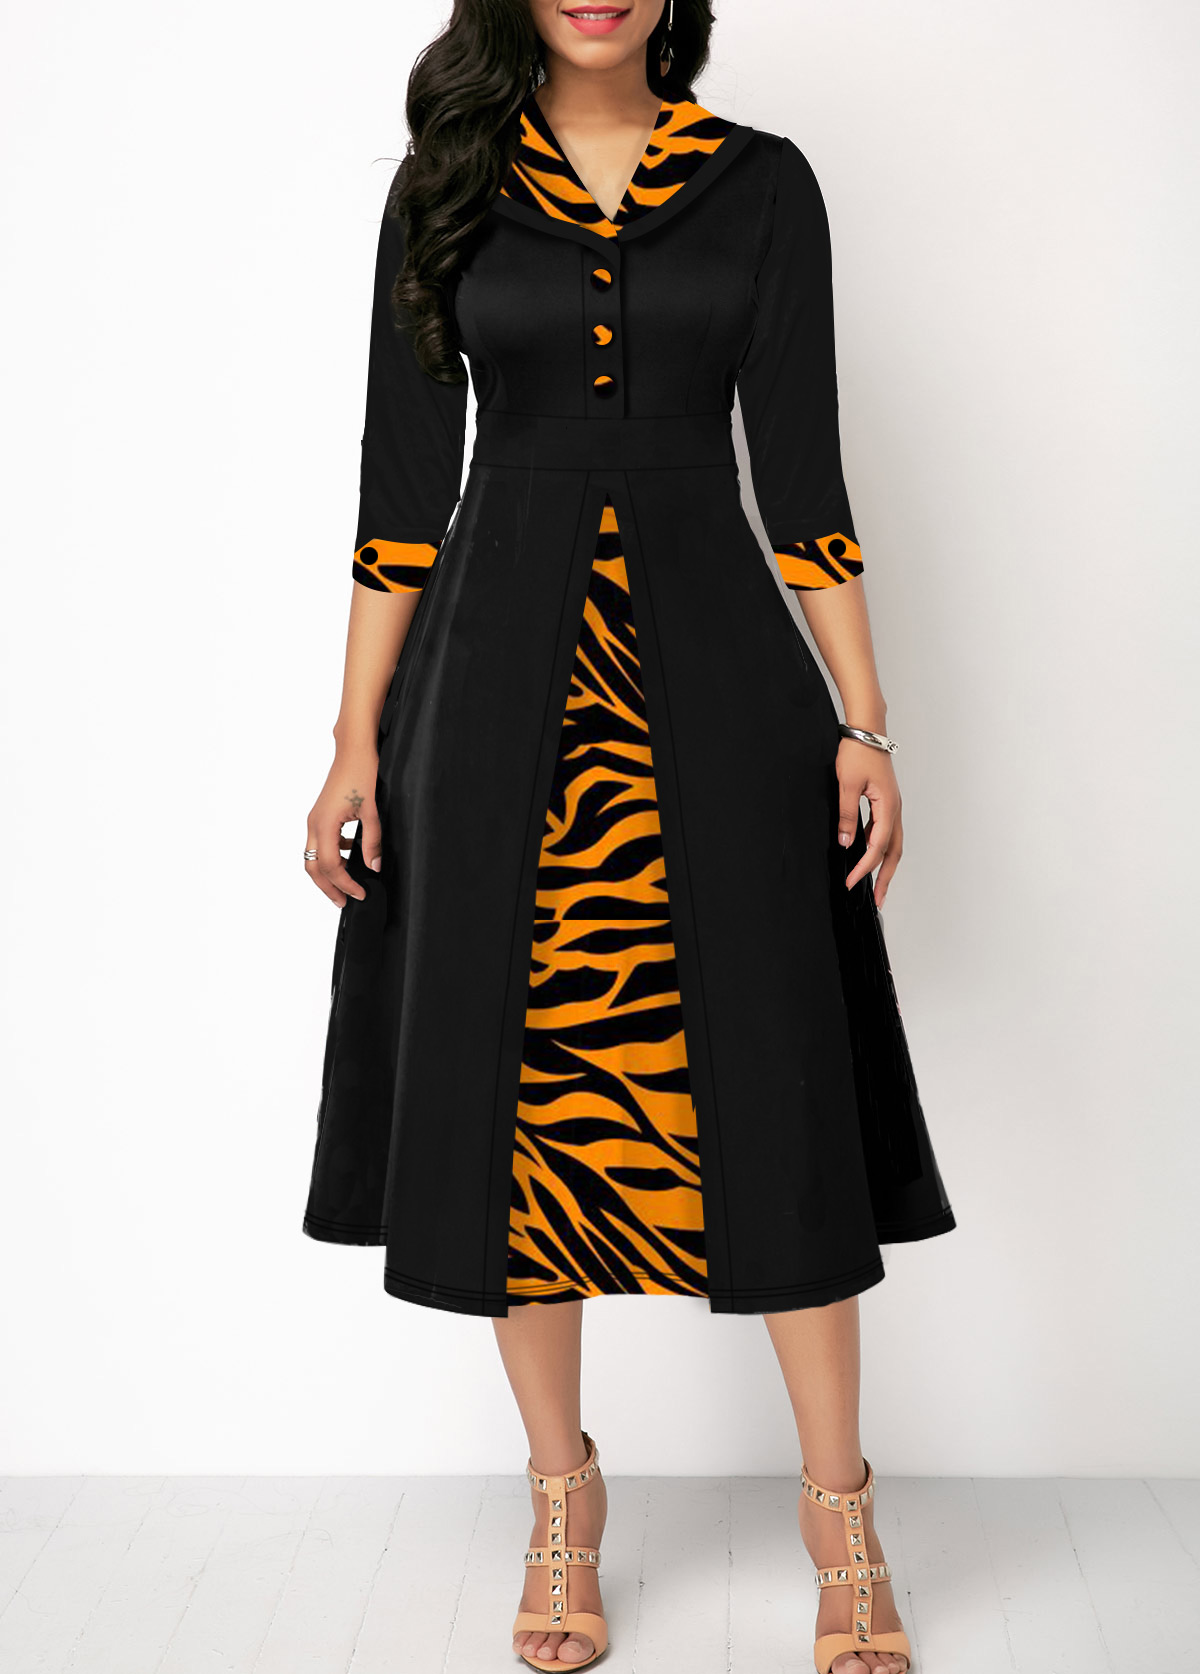 ROTITA High Waist Zebra Print Three Quarter Sleeve Dress